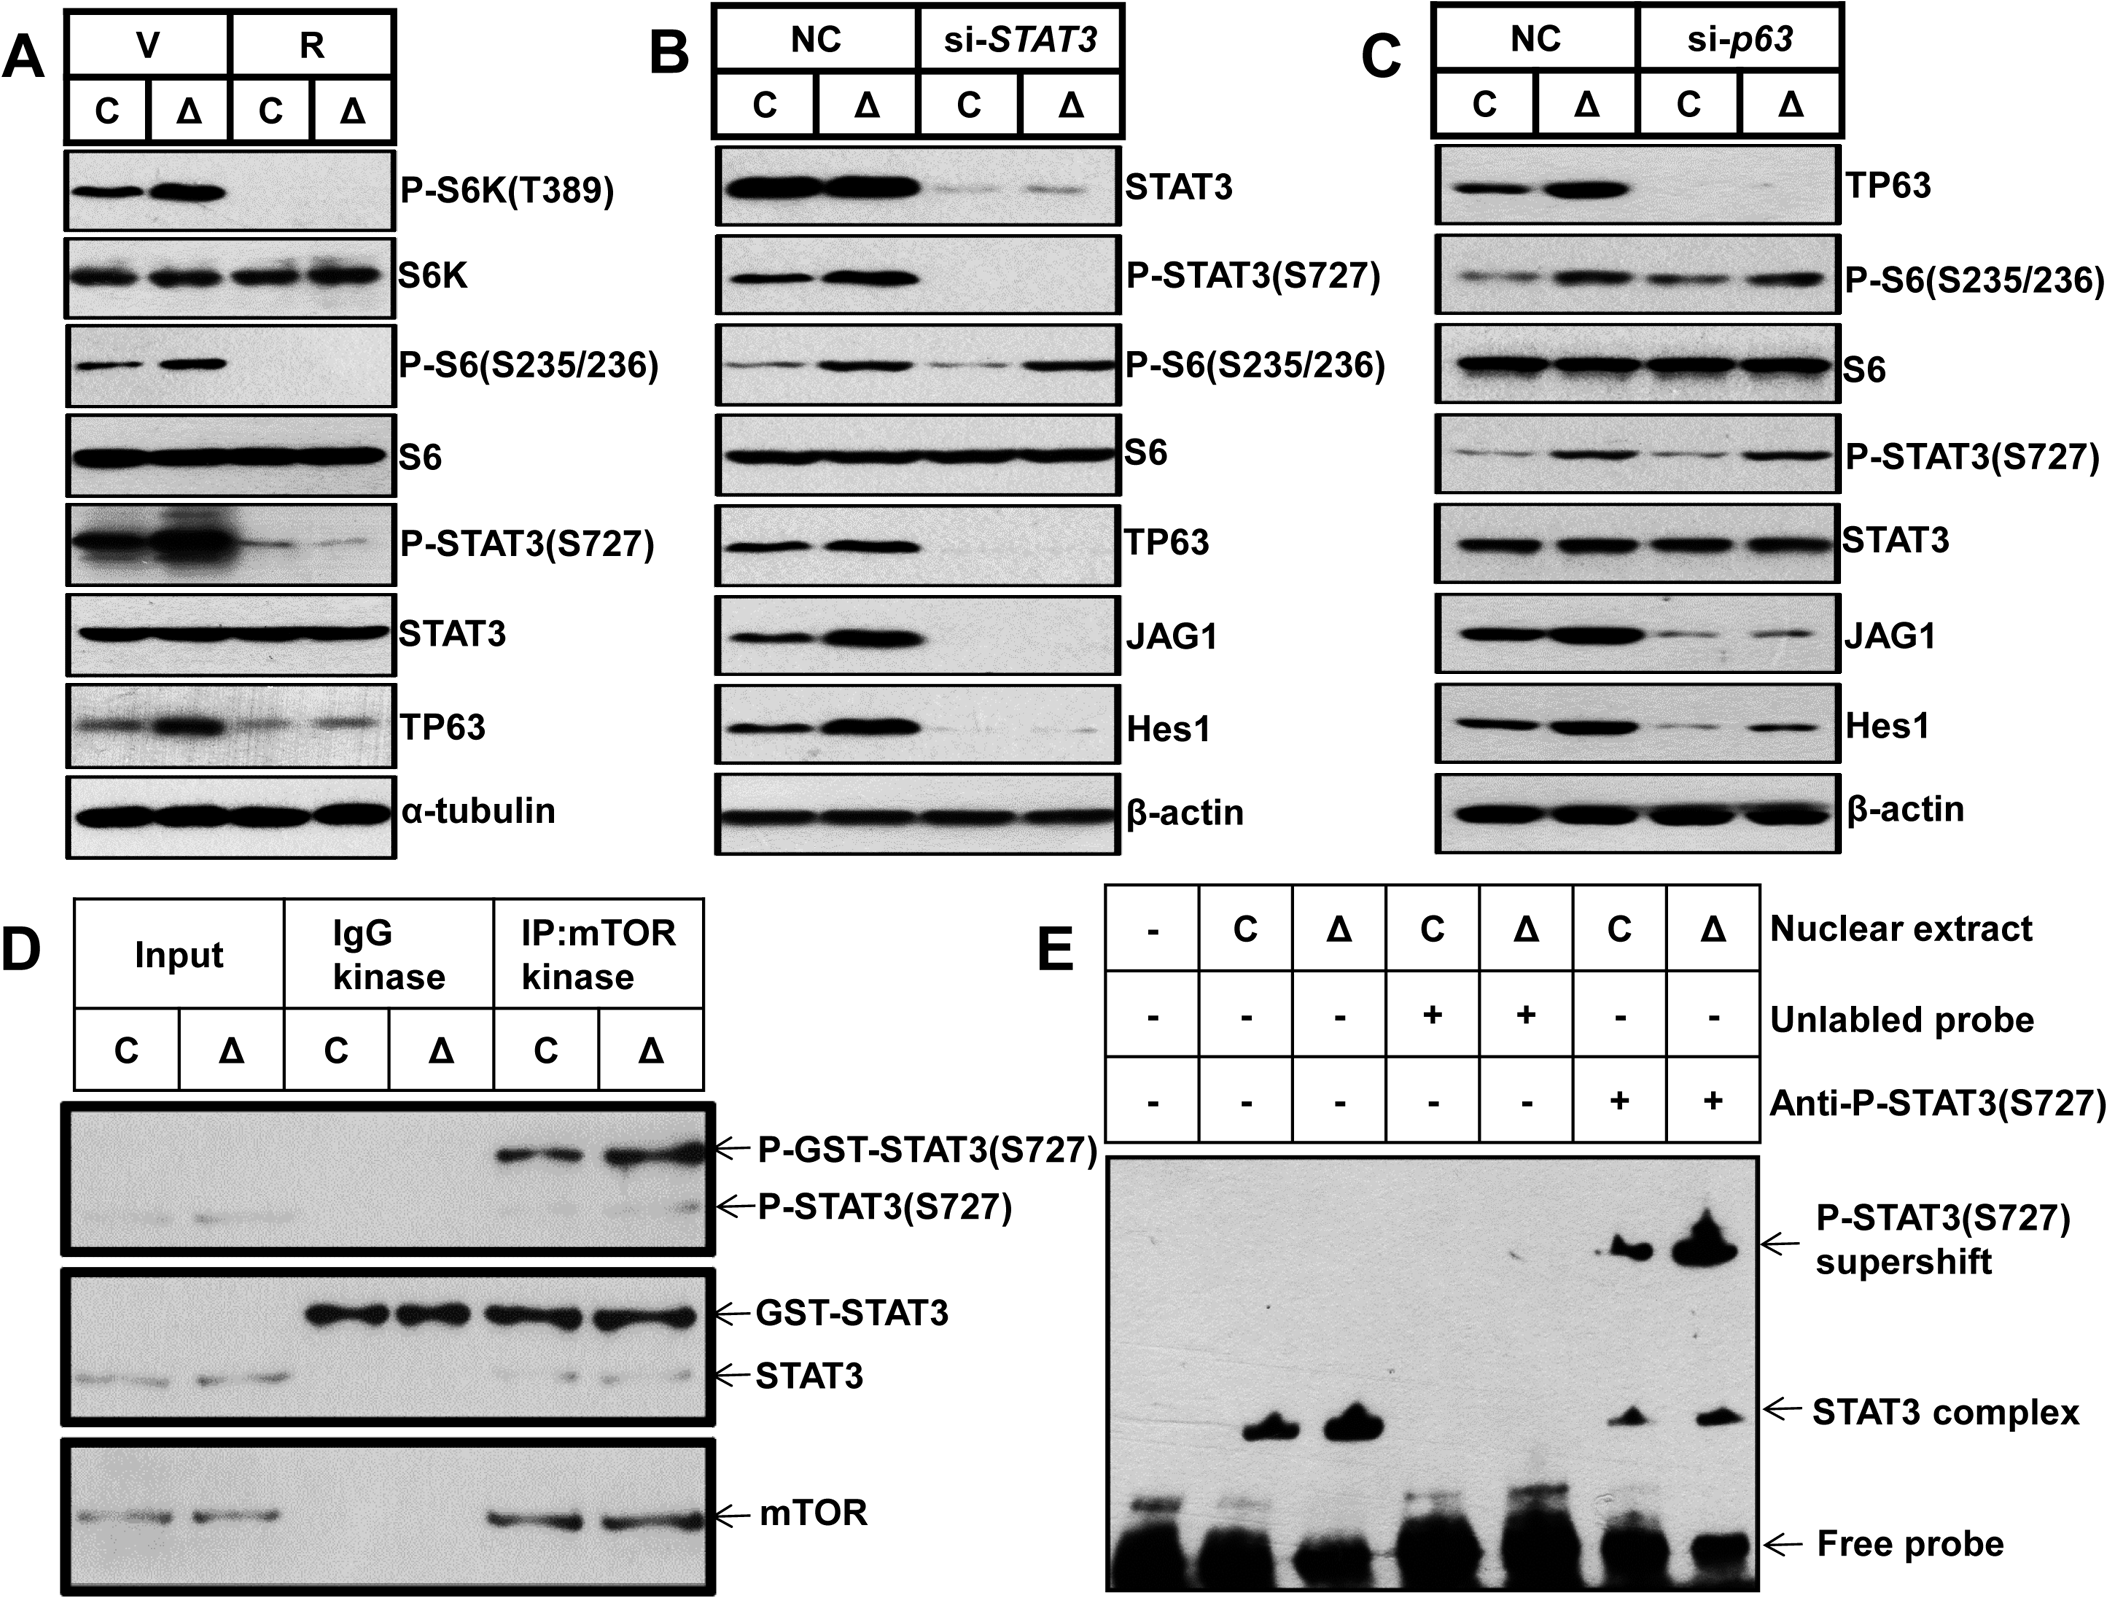 mTORC1 impairs osteoblast differentiation through the STAT3/p63/Jagged/Notch cascade upstream of Runx2.